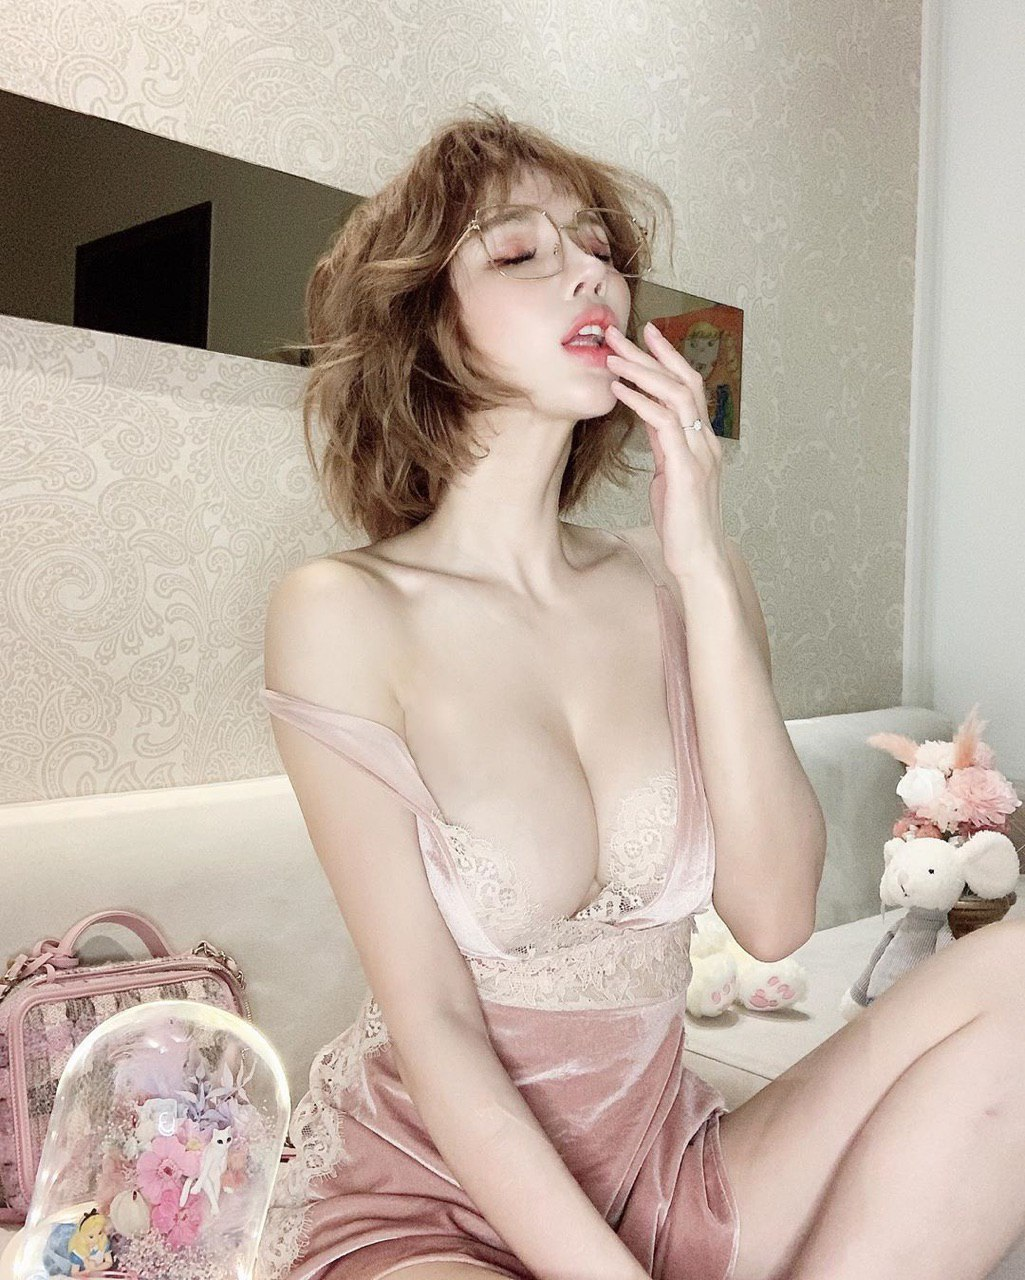 photo_3656@13-03-2020_01-53-39.jpg